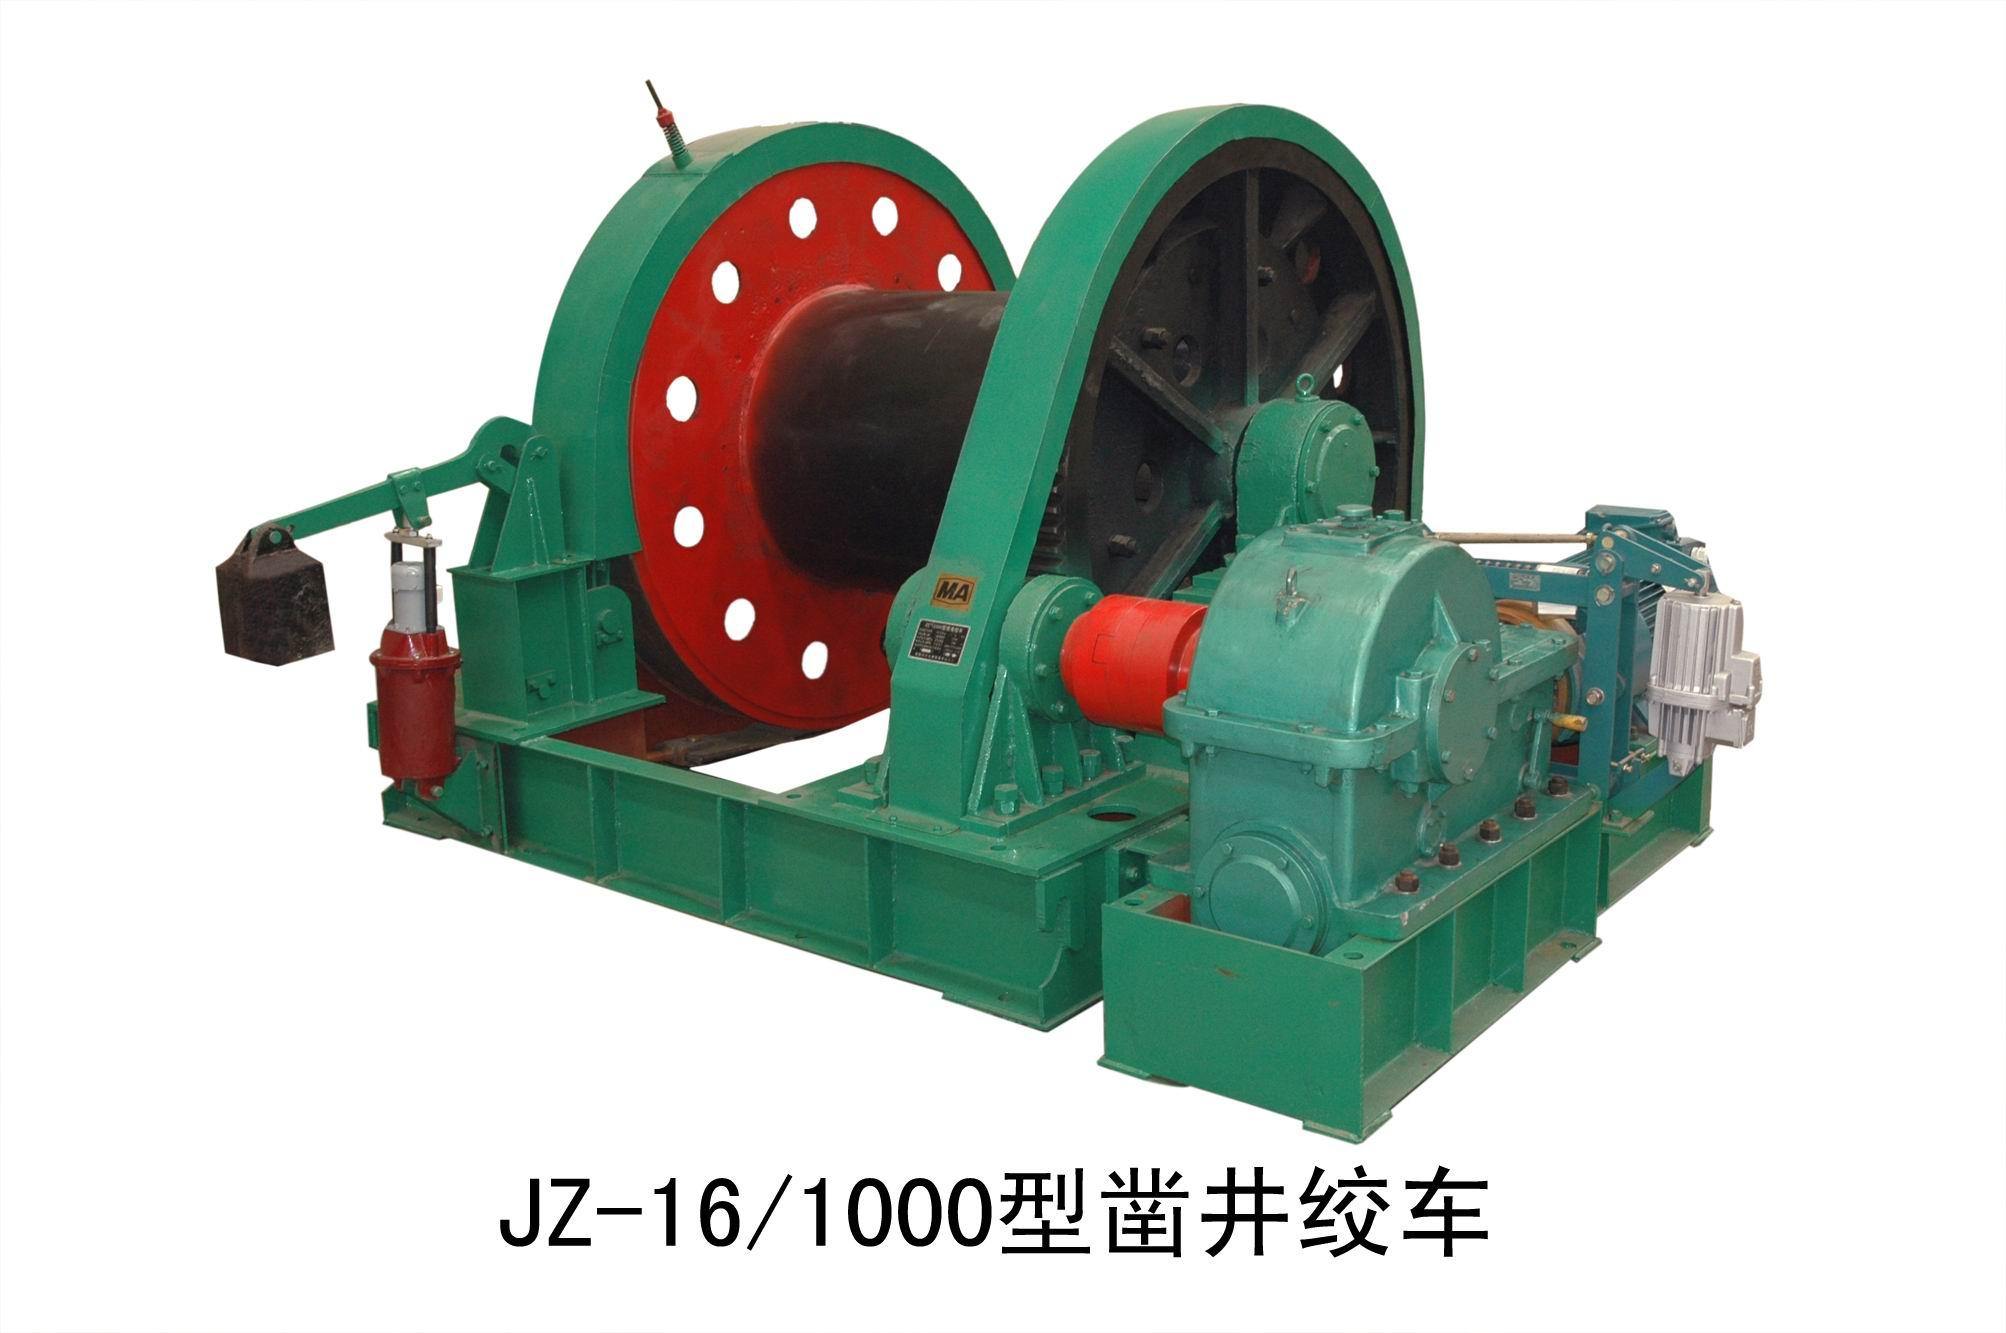 JZ系列凿井绞车